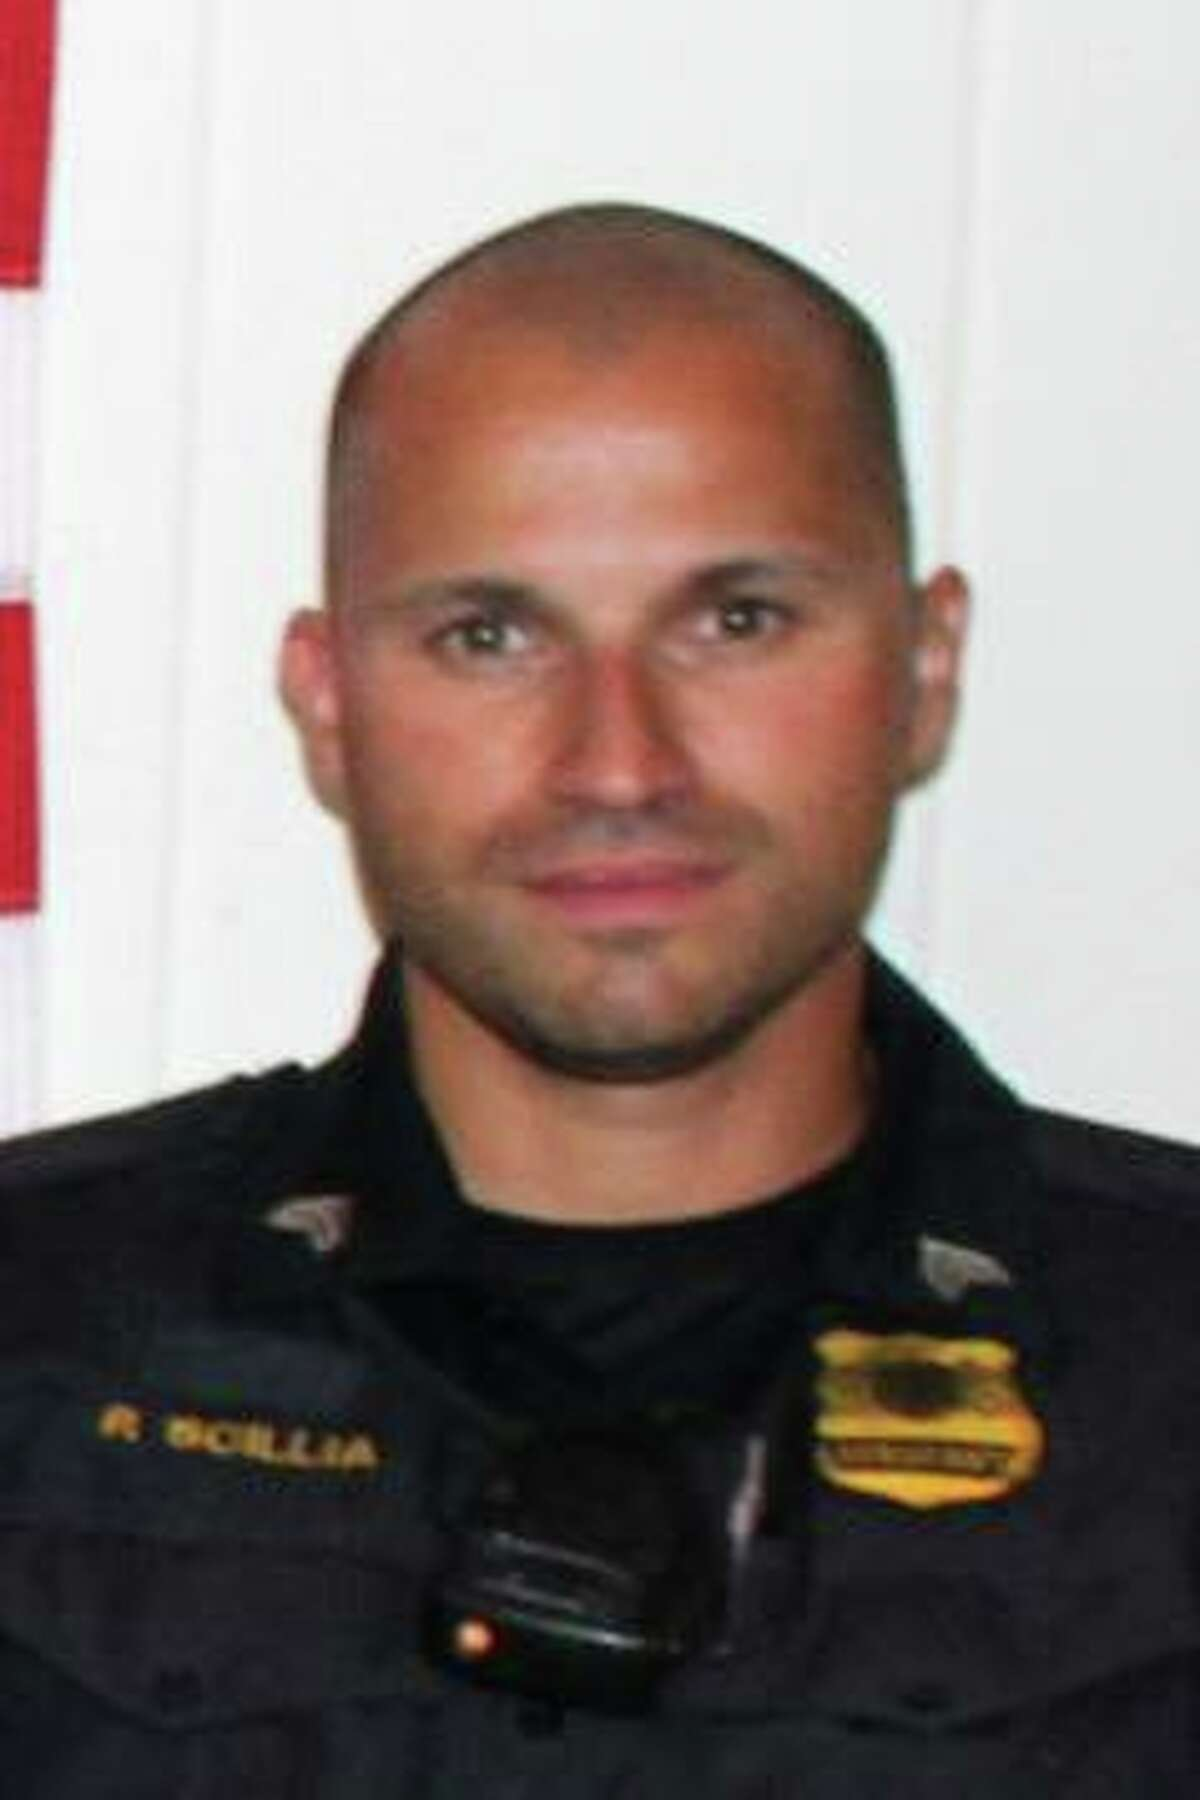 Bridgeport Poice Sgt. Paul Scillia. Bridgeport, Conn. Sept. 11, 2017.